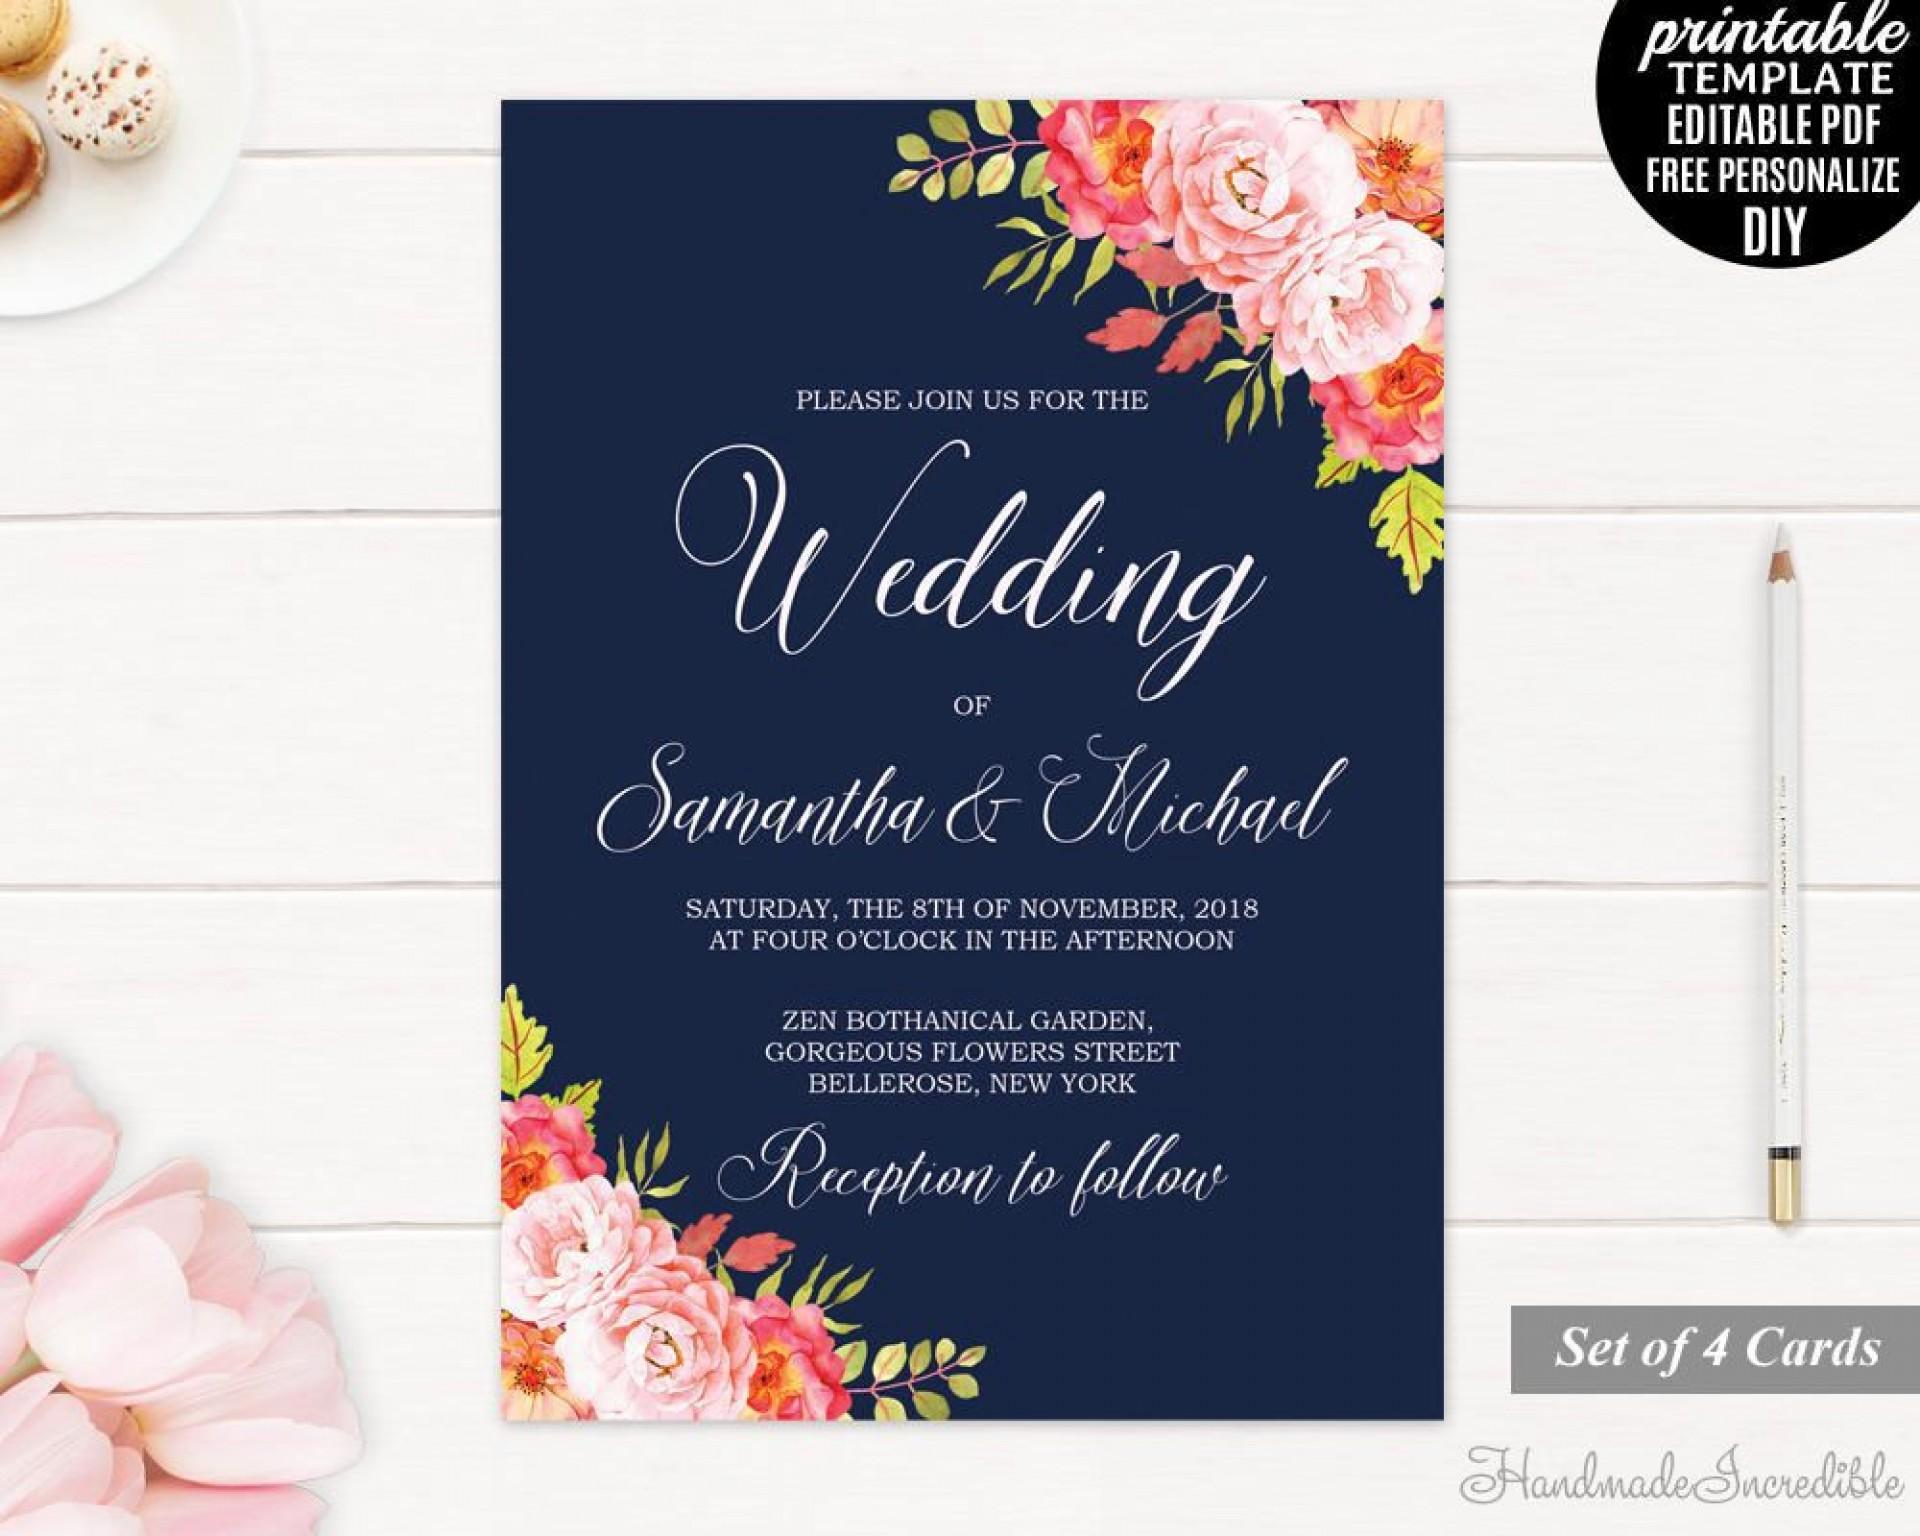 001 Wondrou Editable Wedding Invitation Template Inspiration  Templates Tamil Card Free Download Psd Online1920